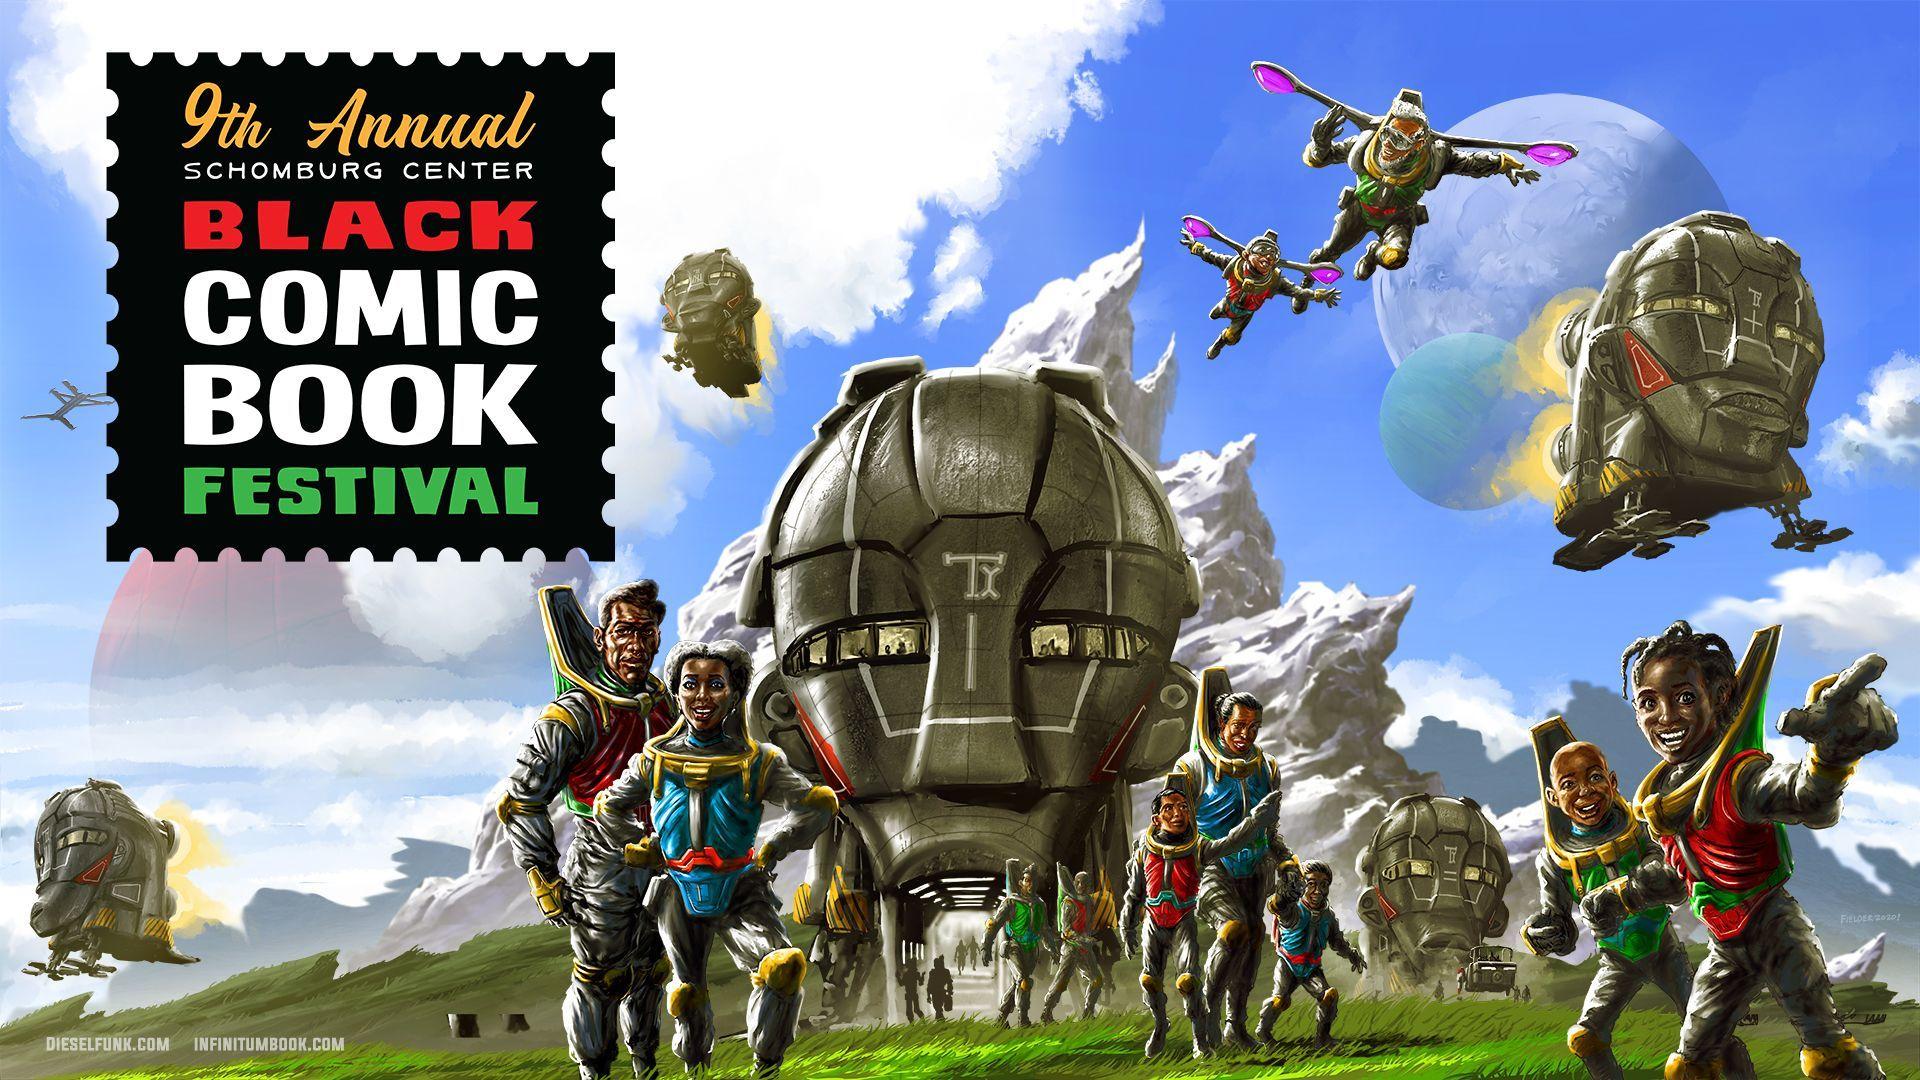 The Schomburg Center's Black Comic Book Festival